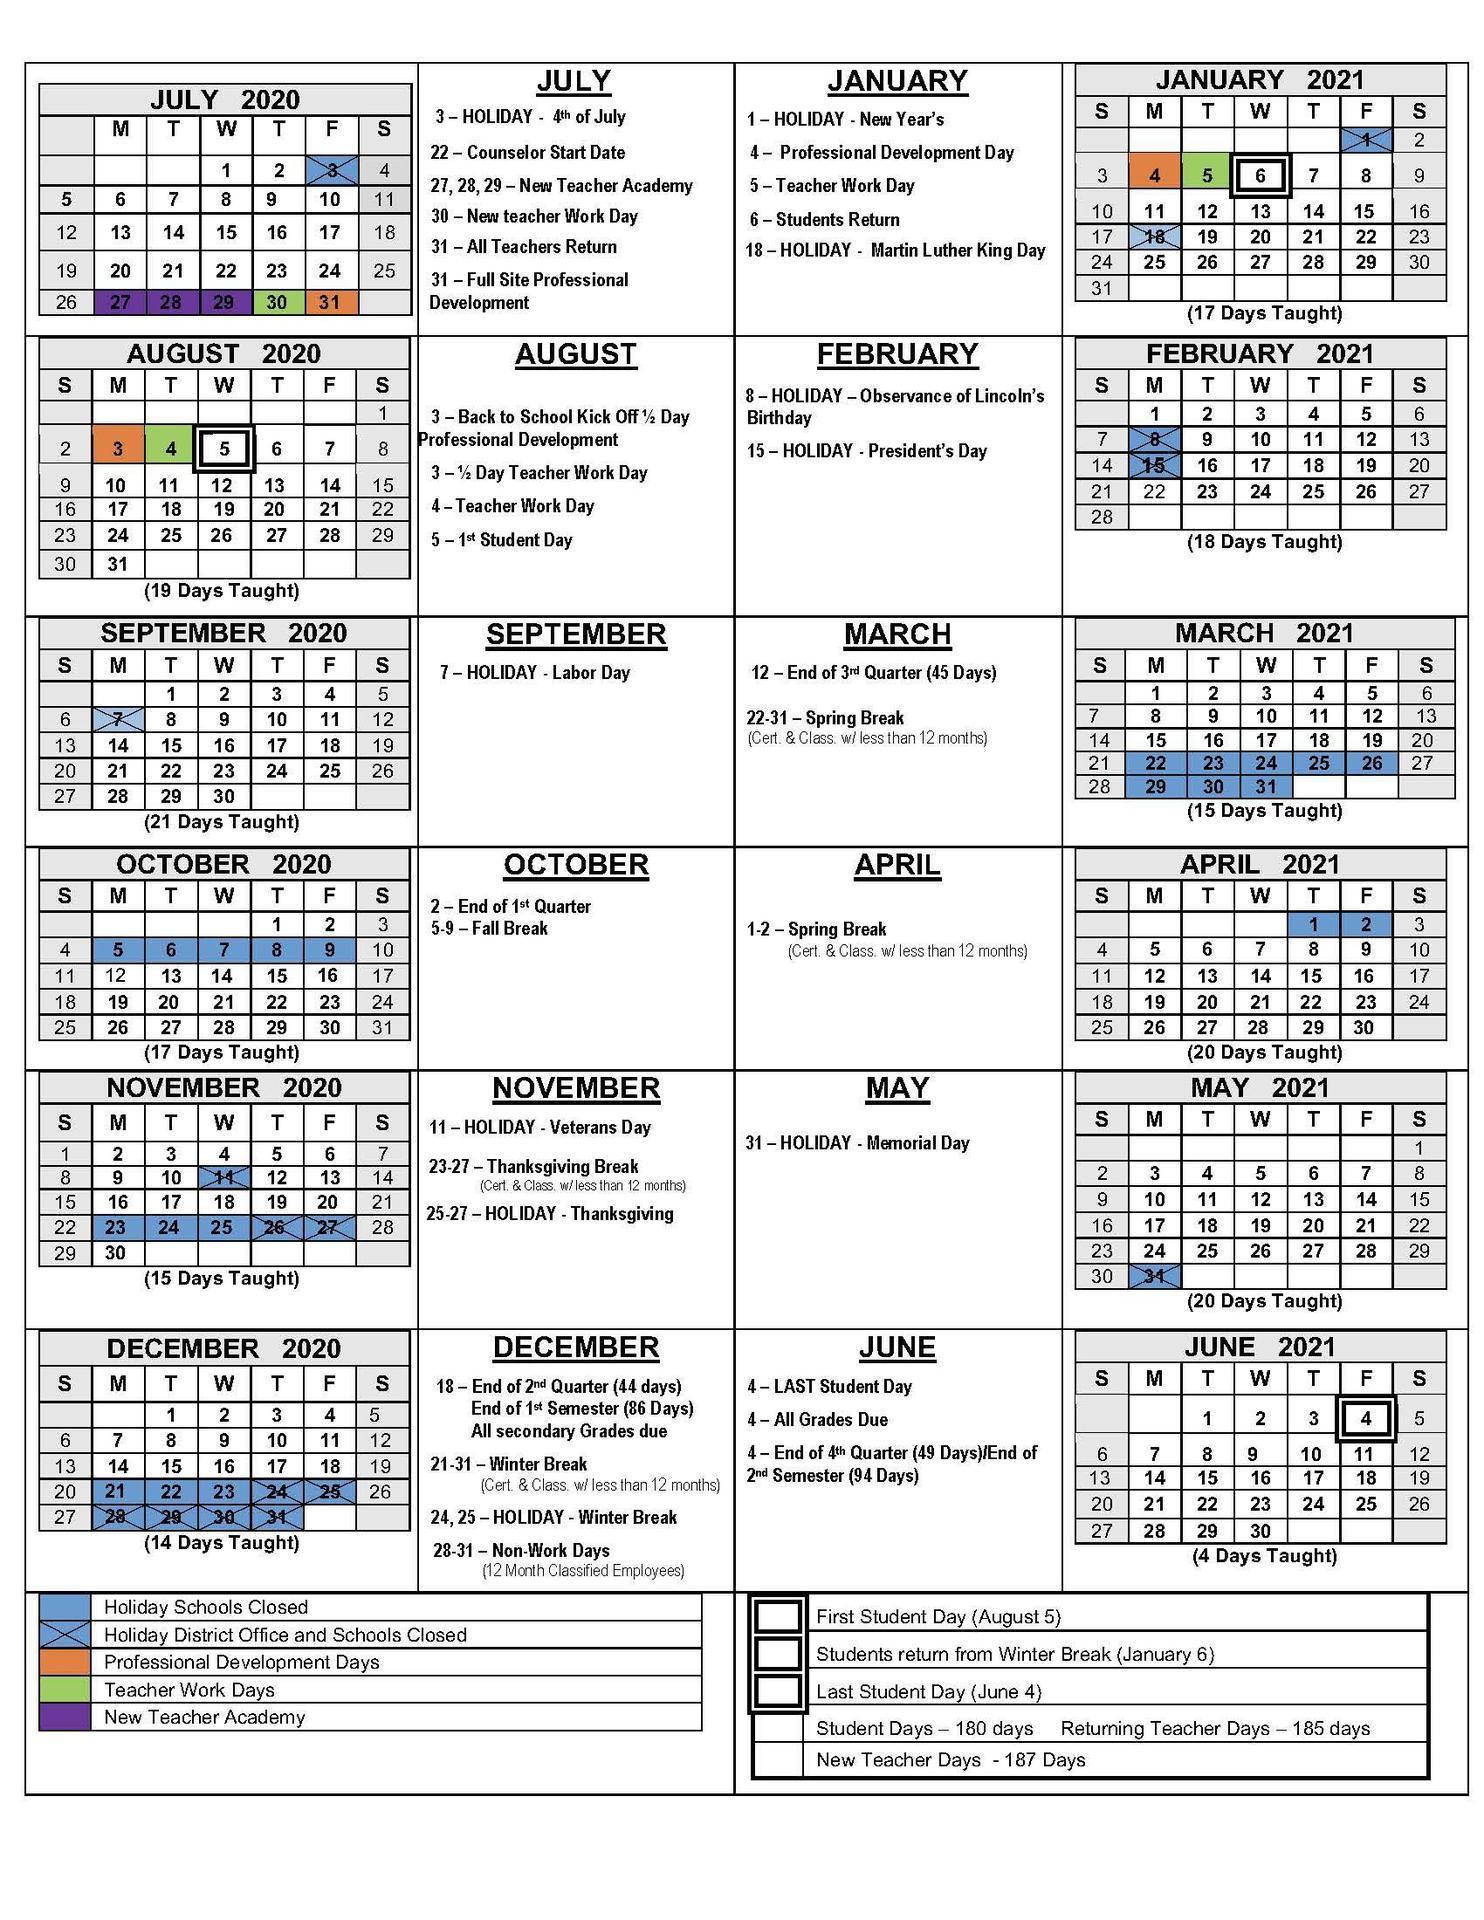 Gilroy Unified School District Calendar 2021 | Printable Regarding Wilkes Barre Area School District Calander 2021